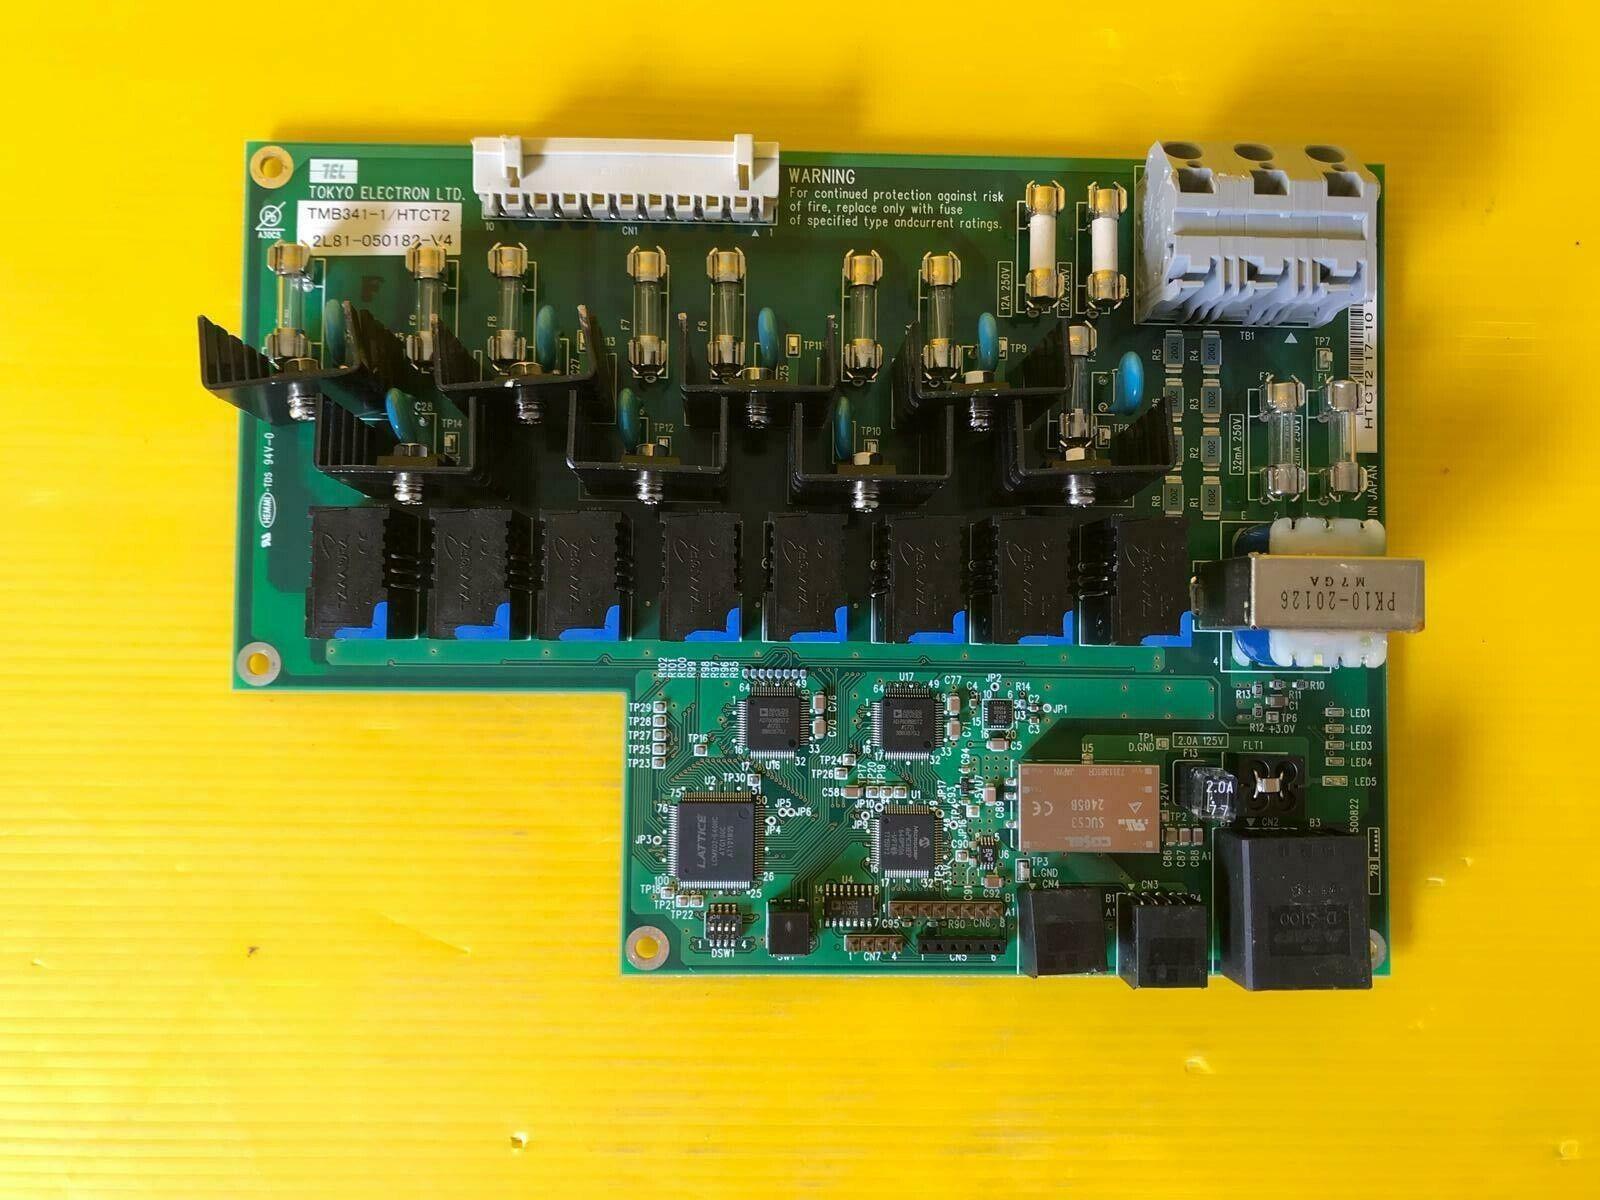 TOKYO ELECTRON TMB341-1 HTCT2 2L81-050182-V4 HTCT2 17-10 1917